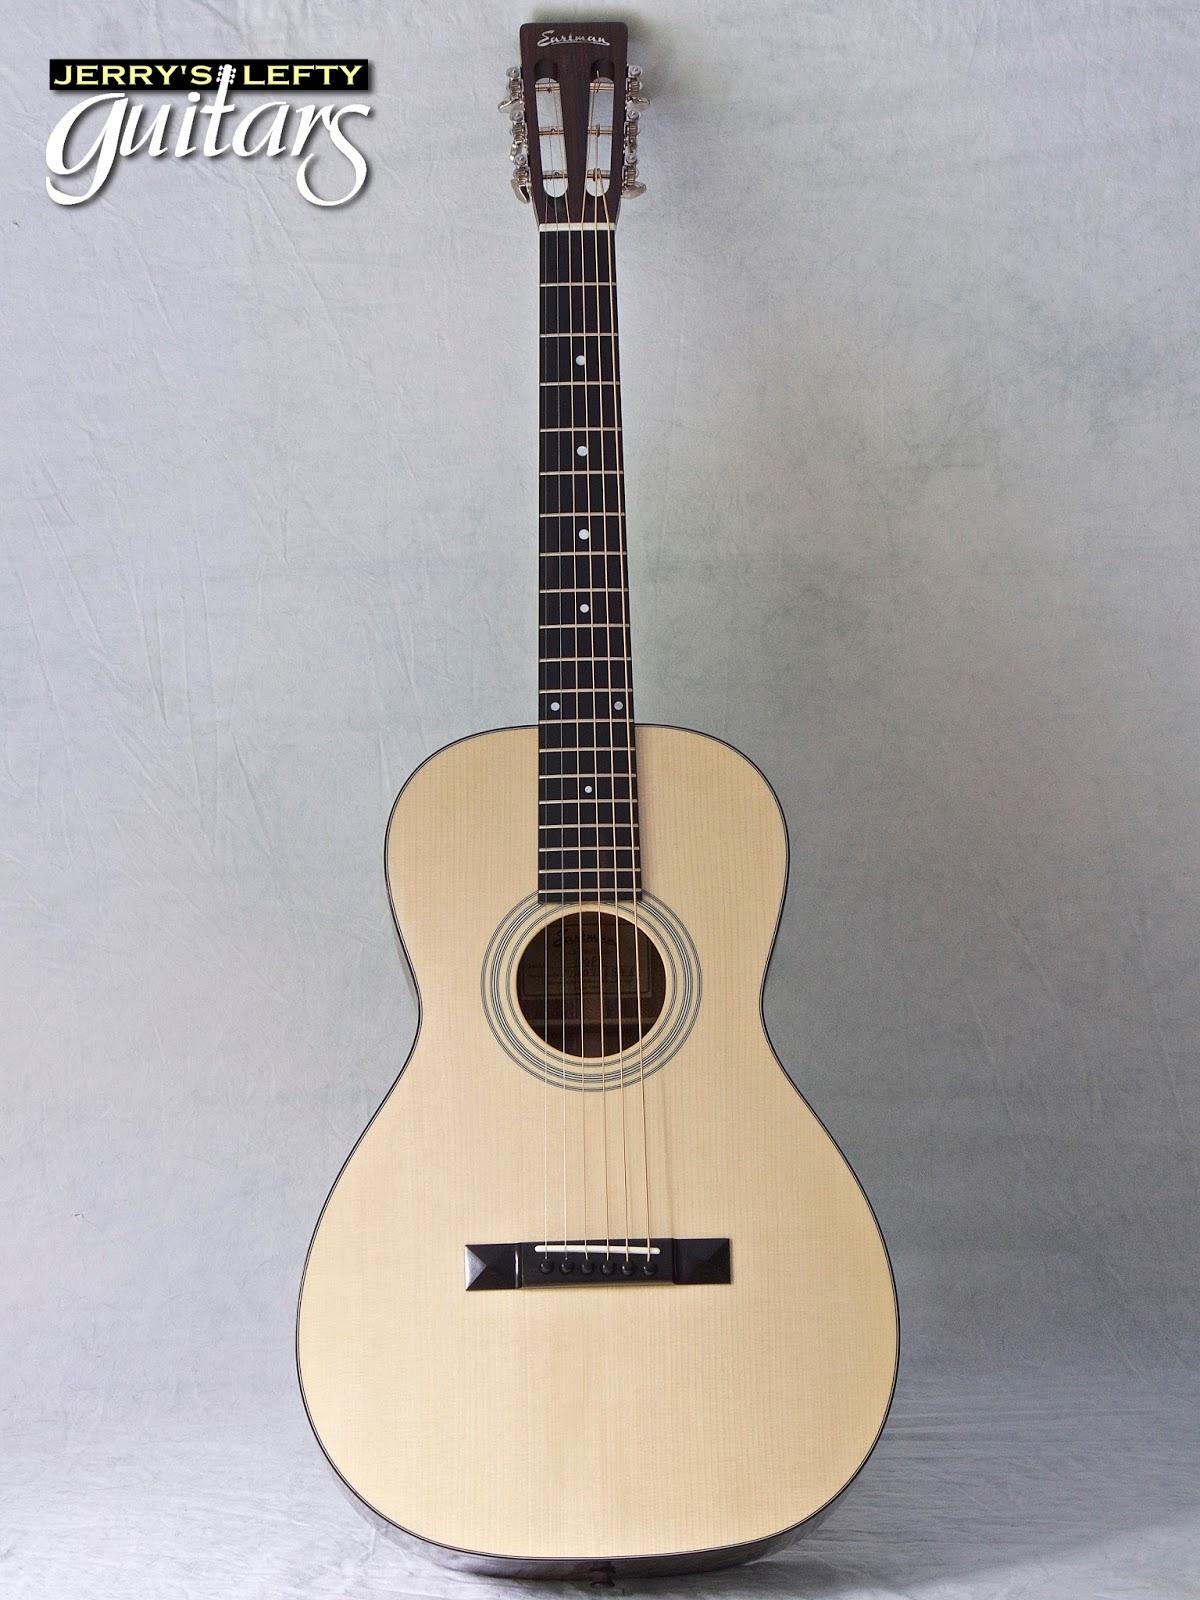 jerry 39 s lefty guitars newest guitar arrivals updated weekly eastman e10p left handed parlor. Black Bedroom Furniture Sets. Home Design Ideas